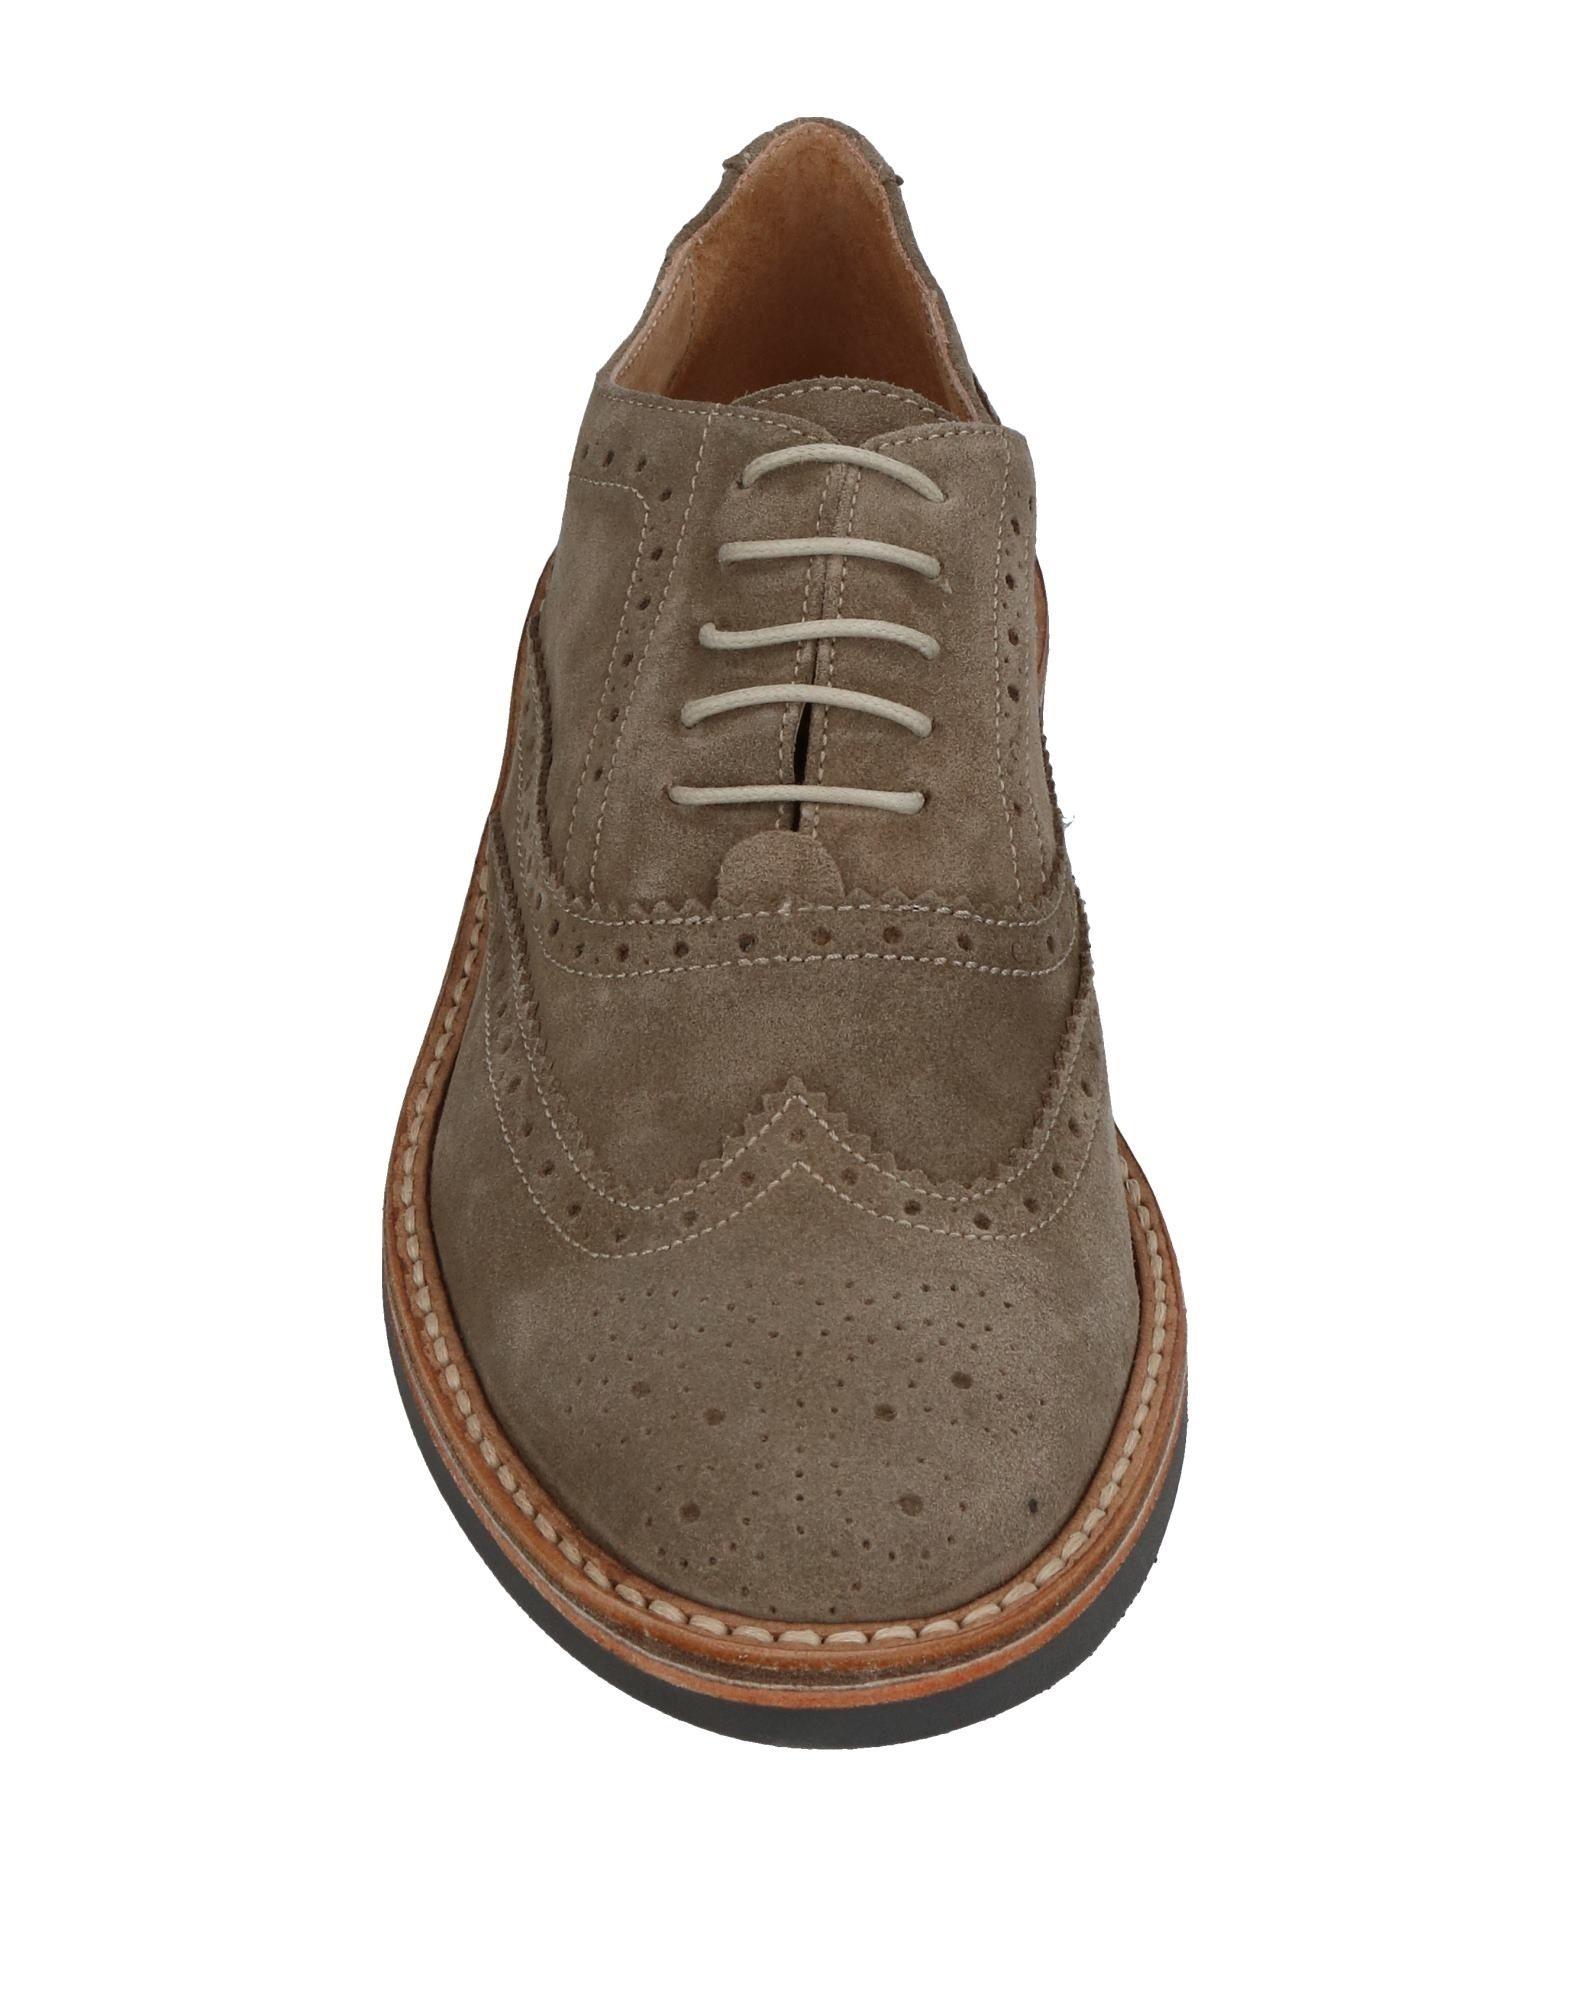 Rabatt echte Schuhe Cantarelli Schnürschuhe Schnürschuhe Cantarelli Herren  11376243AI 8f1a5e